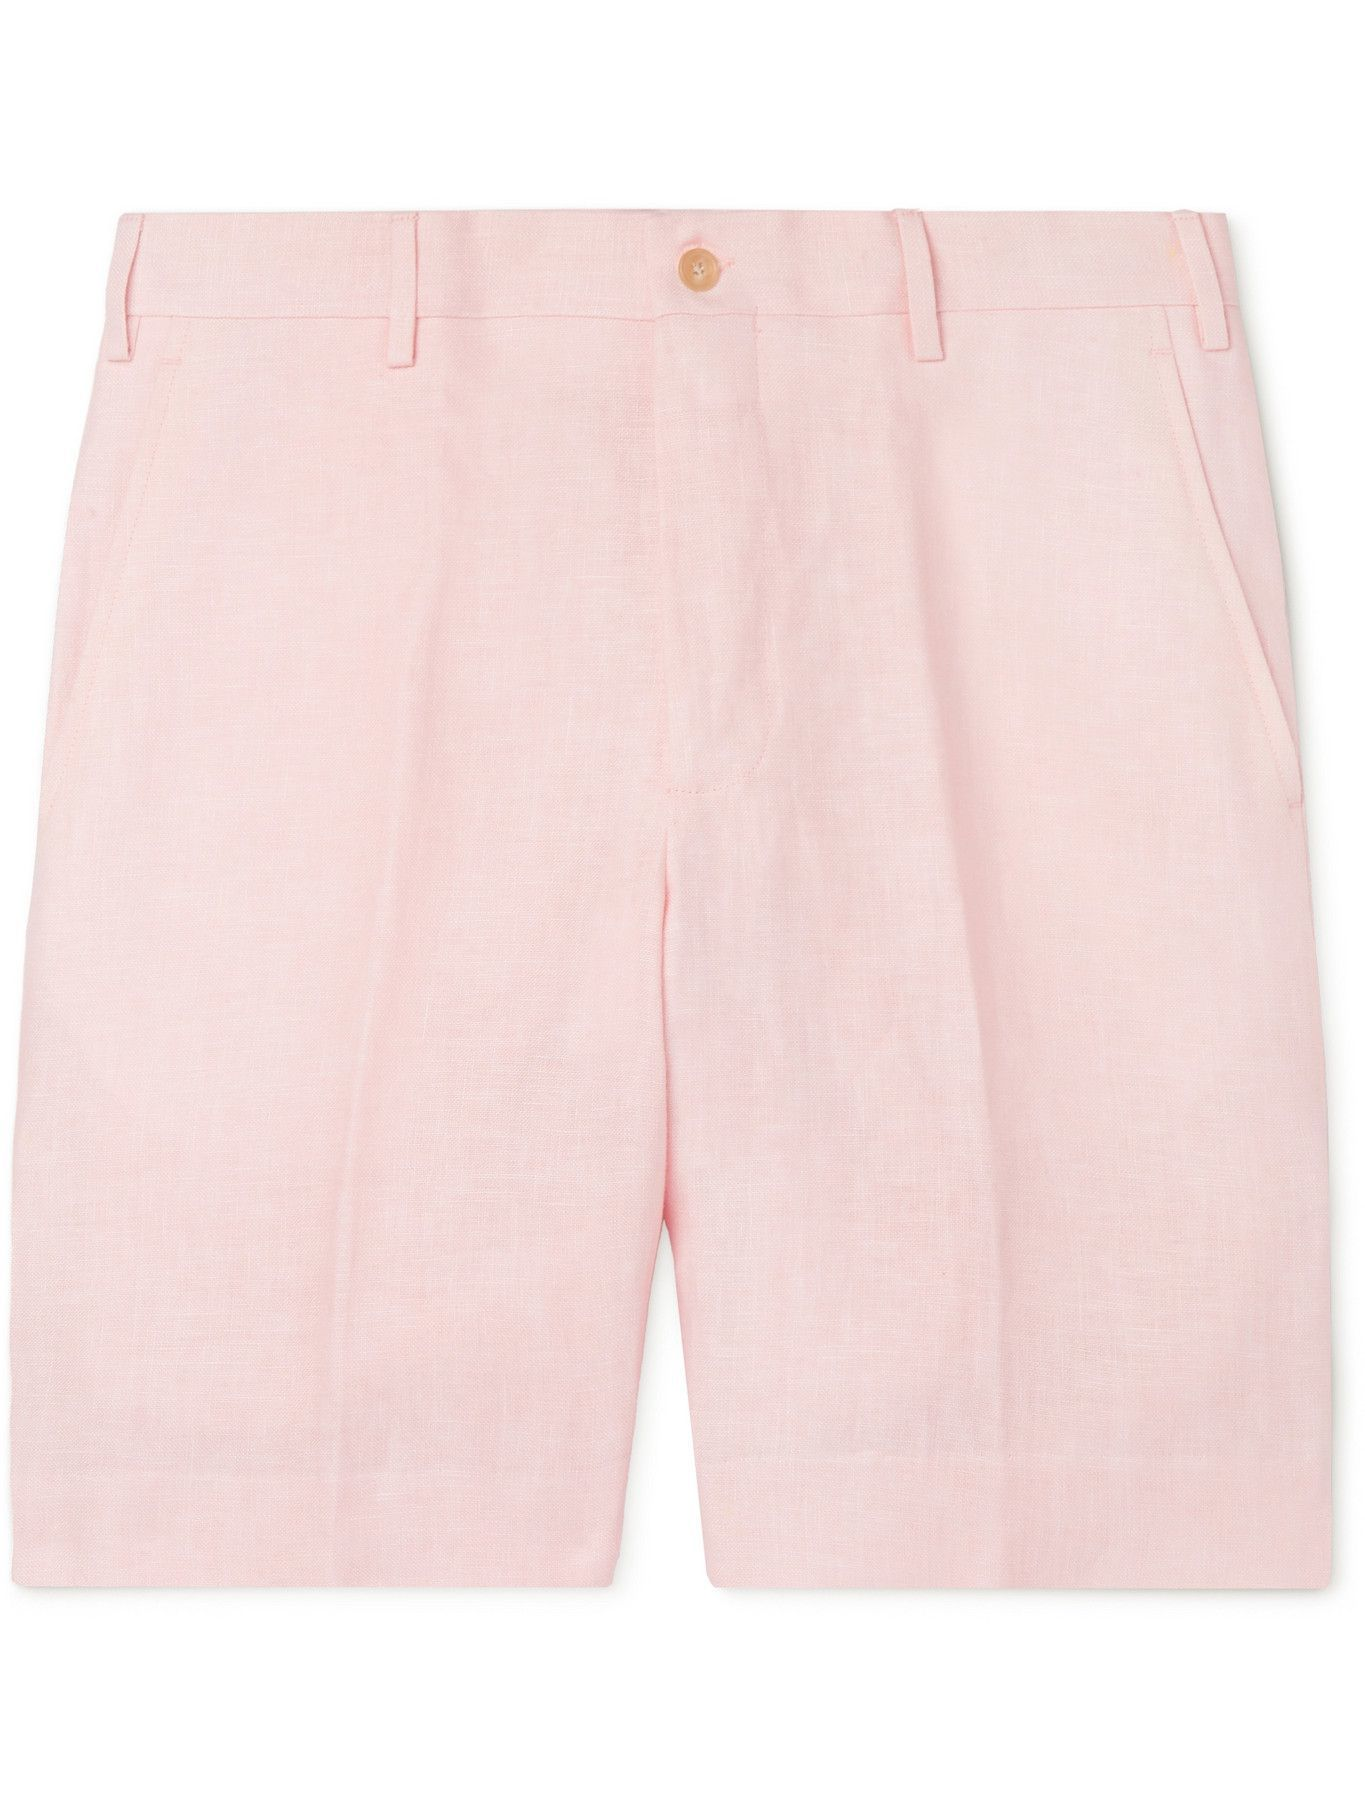 Photo: ANDERSON & SHEPPARD - Wide-Leg Linen Bermuda Shorts - Pink